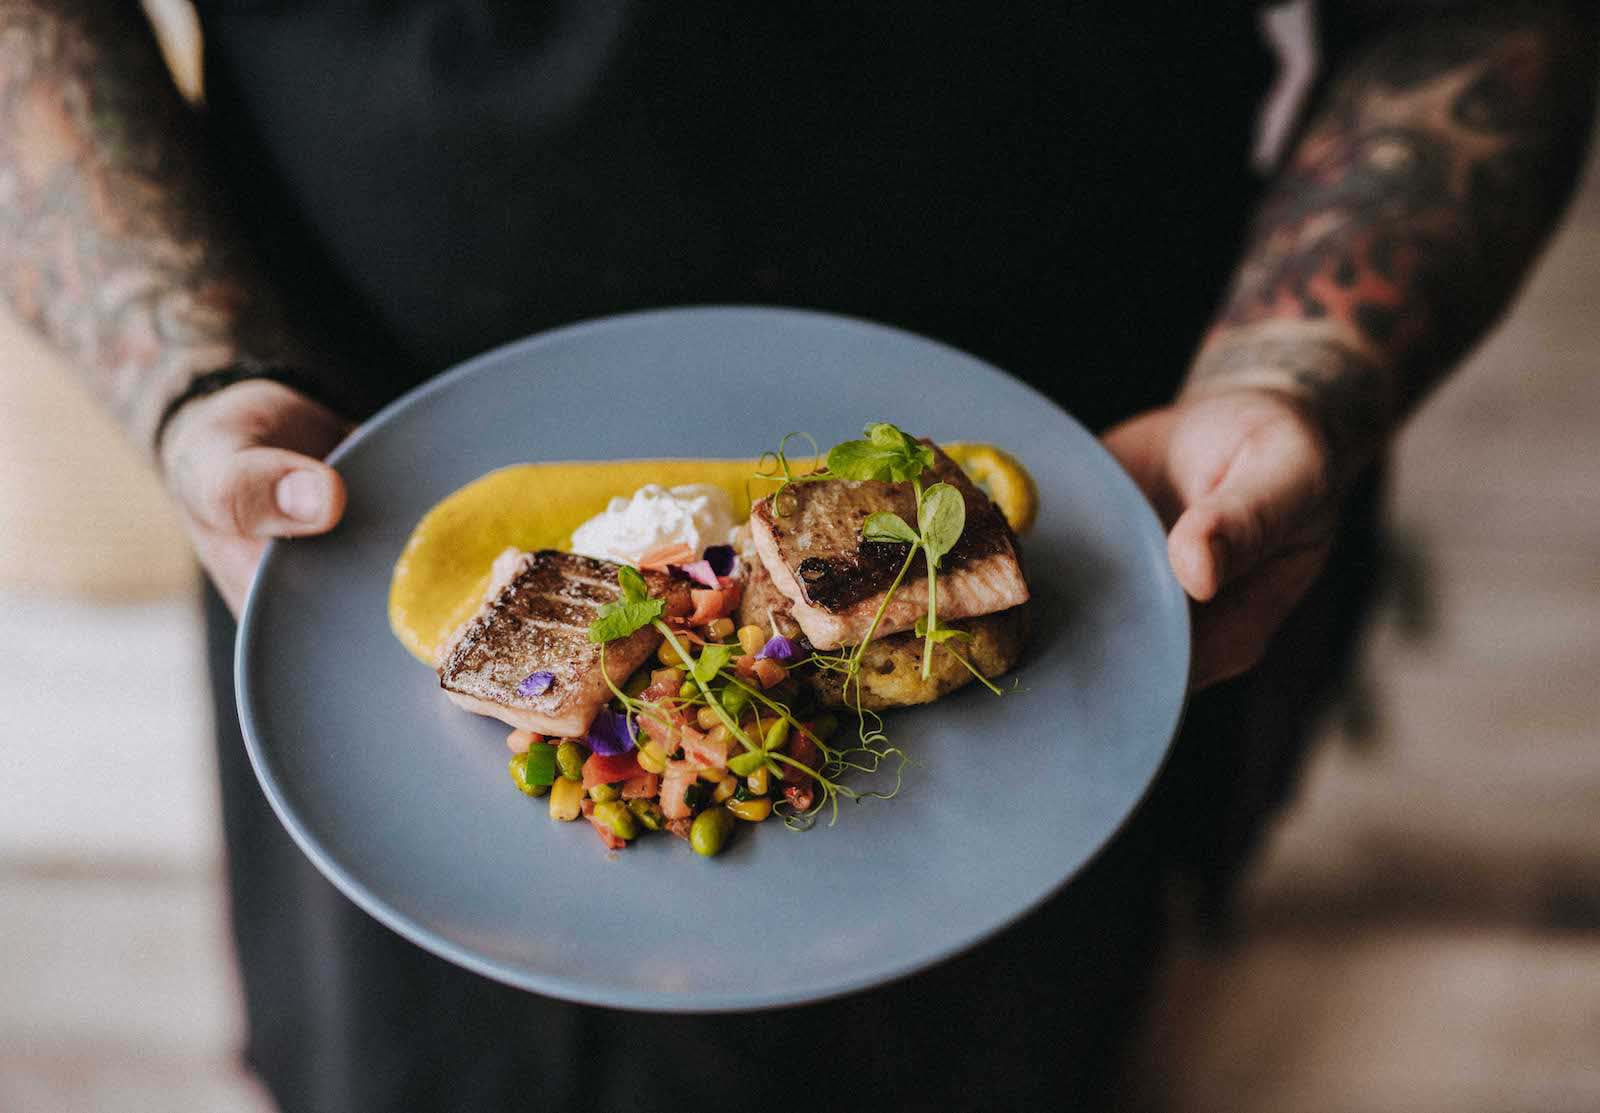 England's Seafood FEAST chef Ash Hamilton